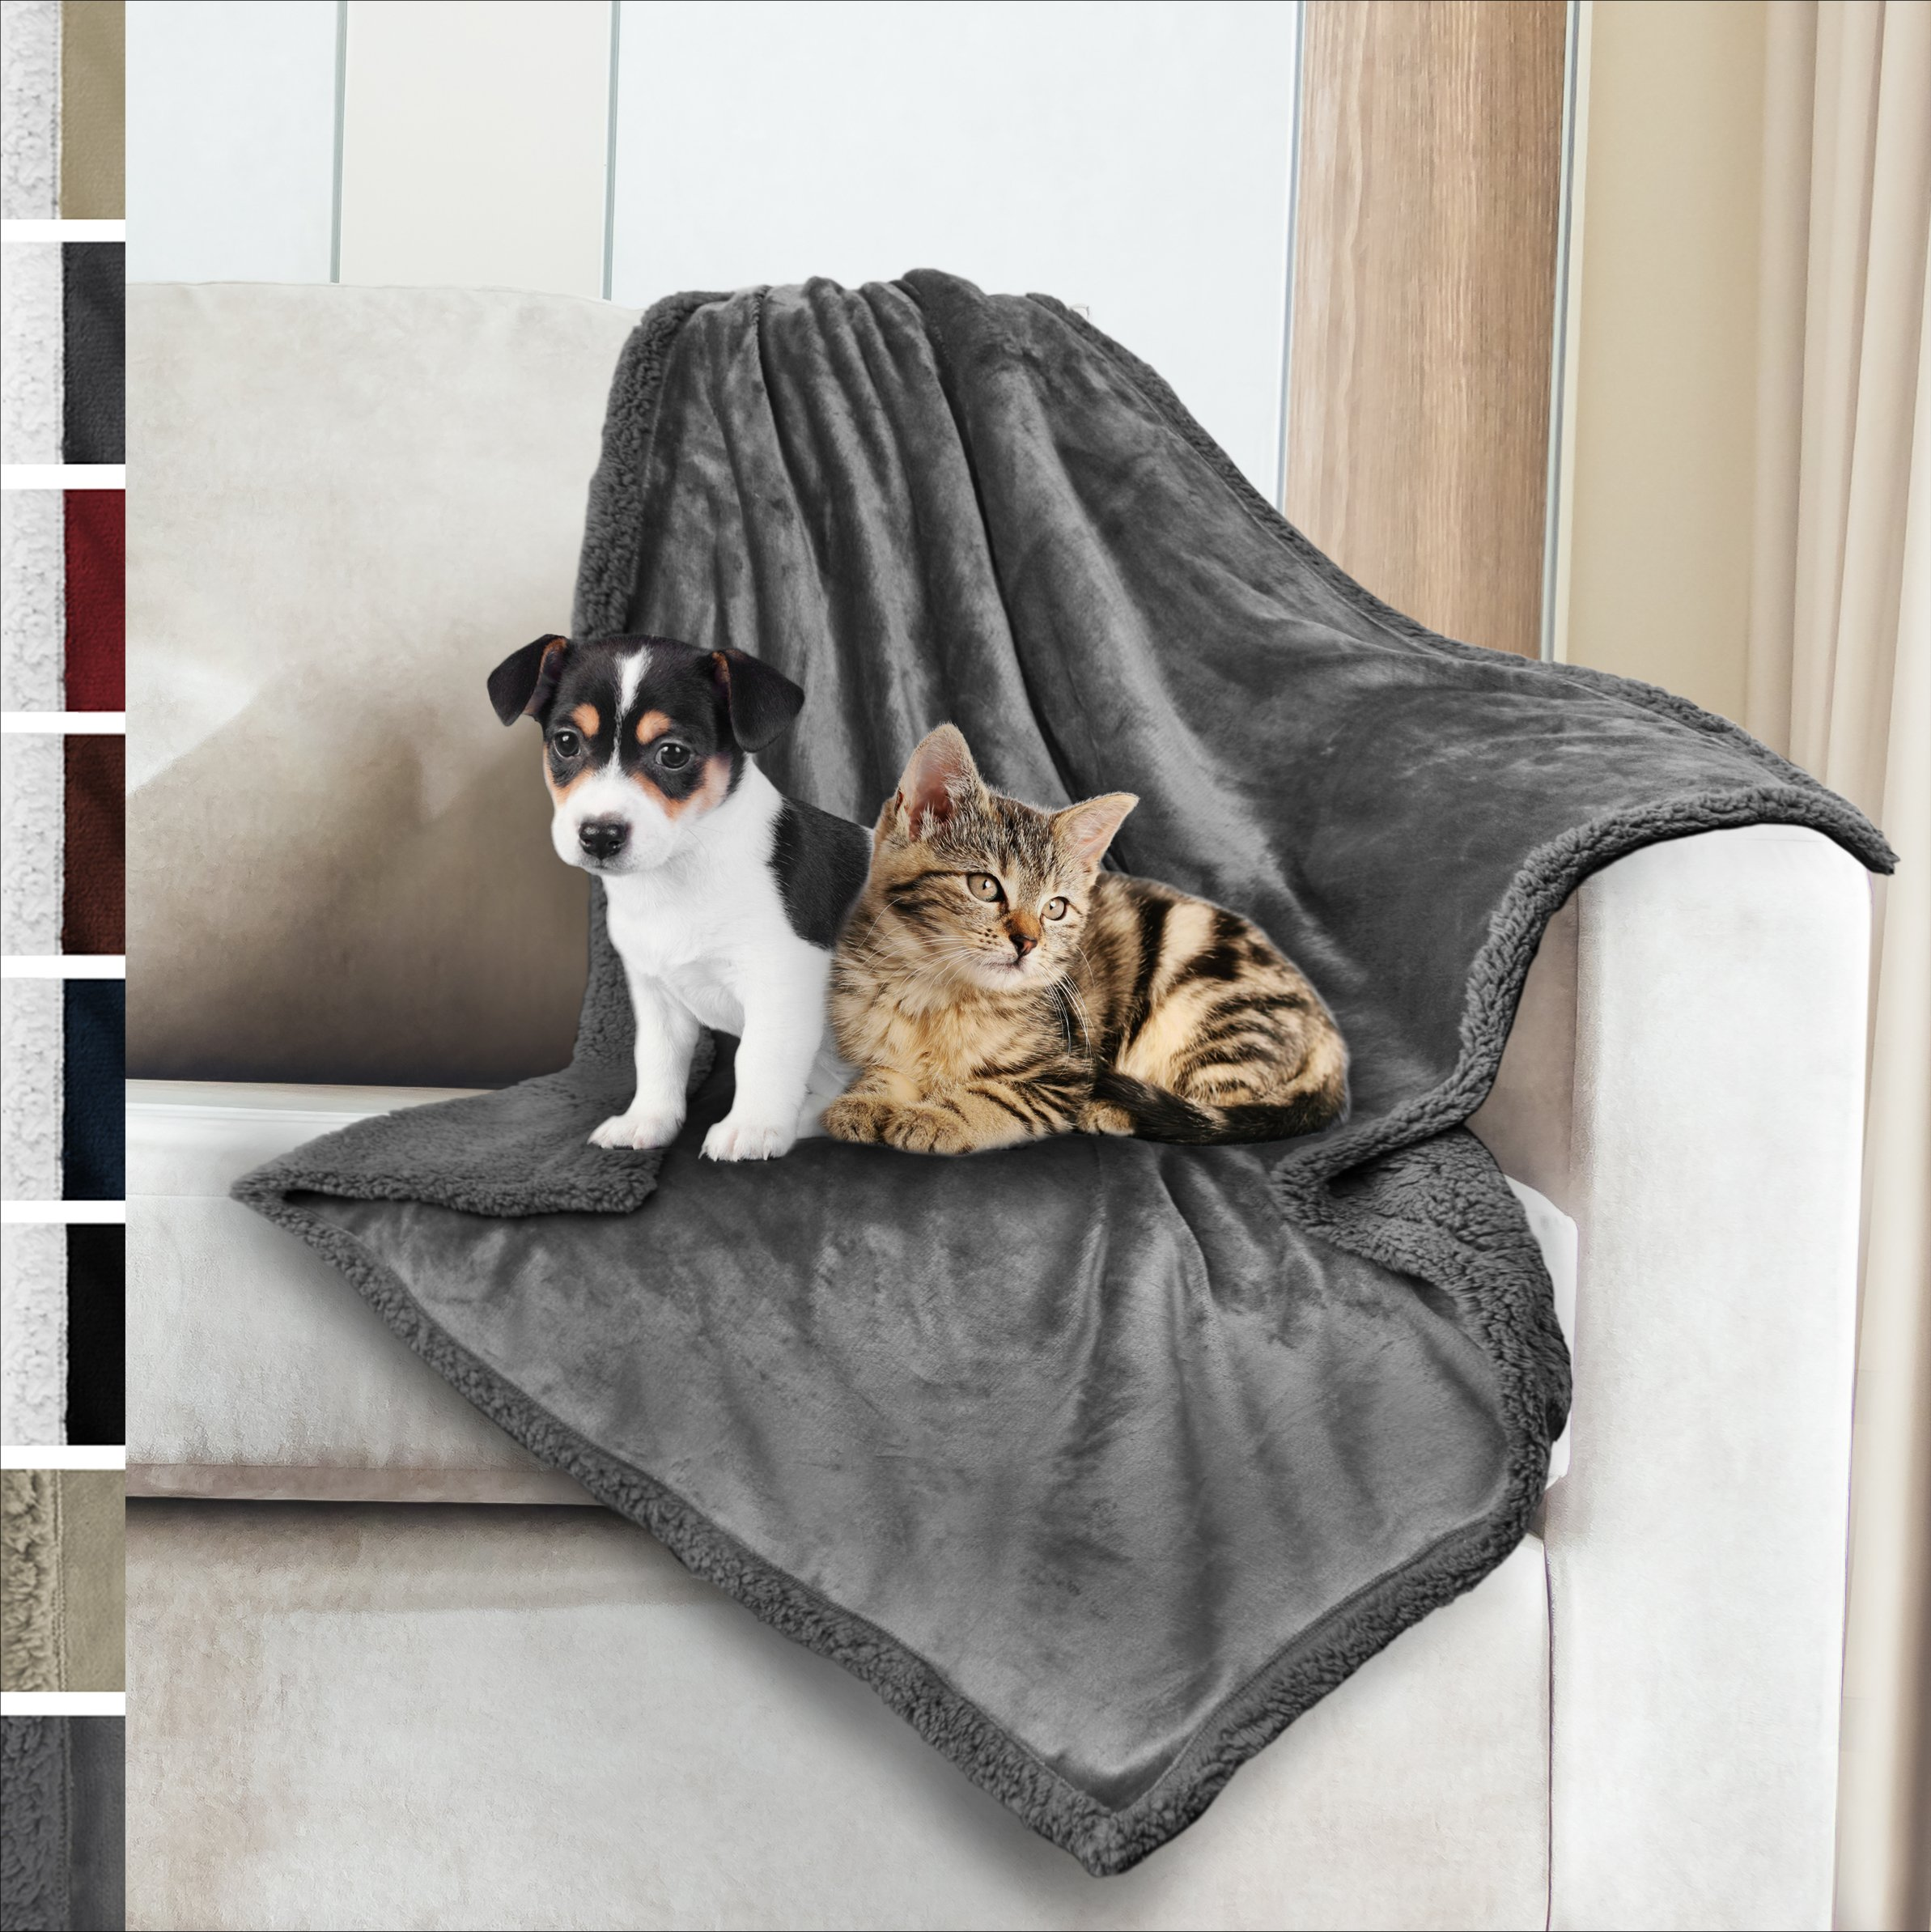 Premium Sherpa Dog Blanket | Pet Throw Blanket for Puppy, Small Dog, Medium Dog or Cat Kitten | Reversible, Soft, Lightweight Microfiber Throw – 30 x 40 Inches (Grey Grey)